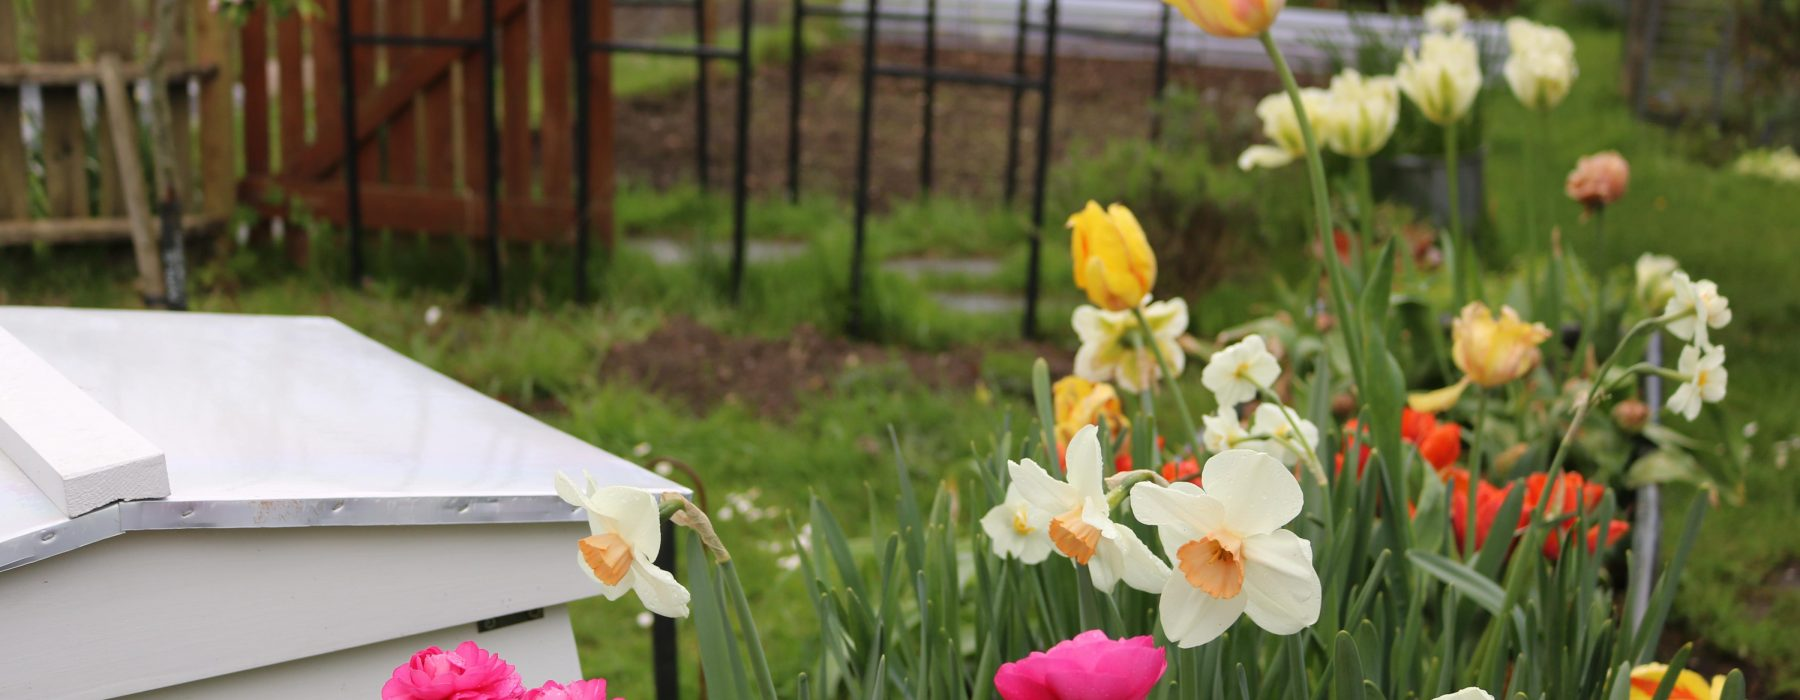 The Spring Bulb Trough